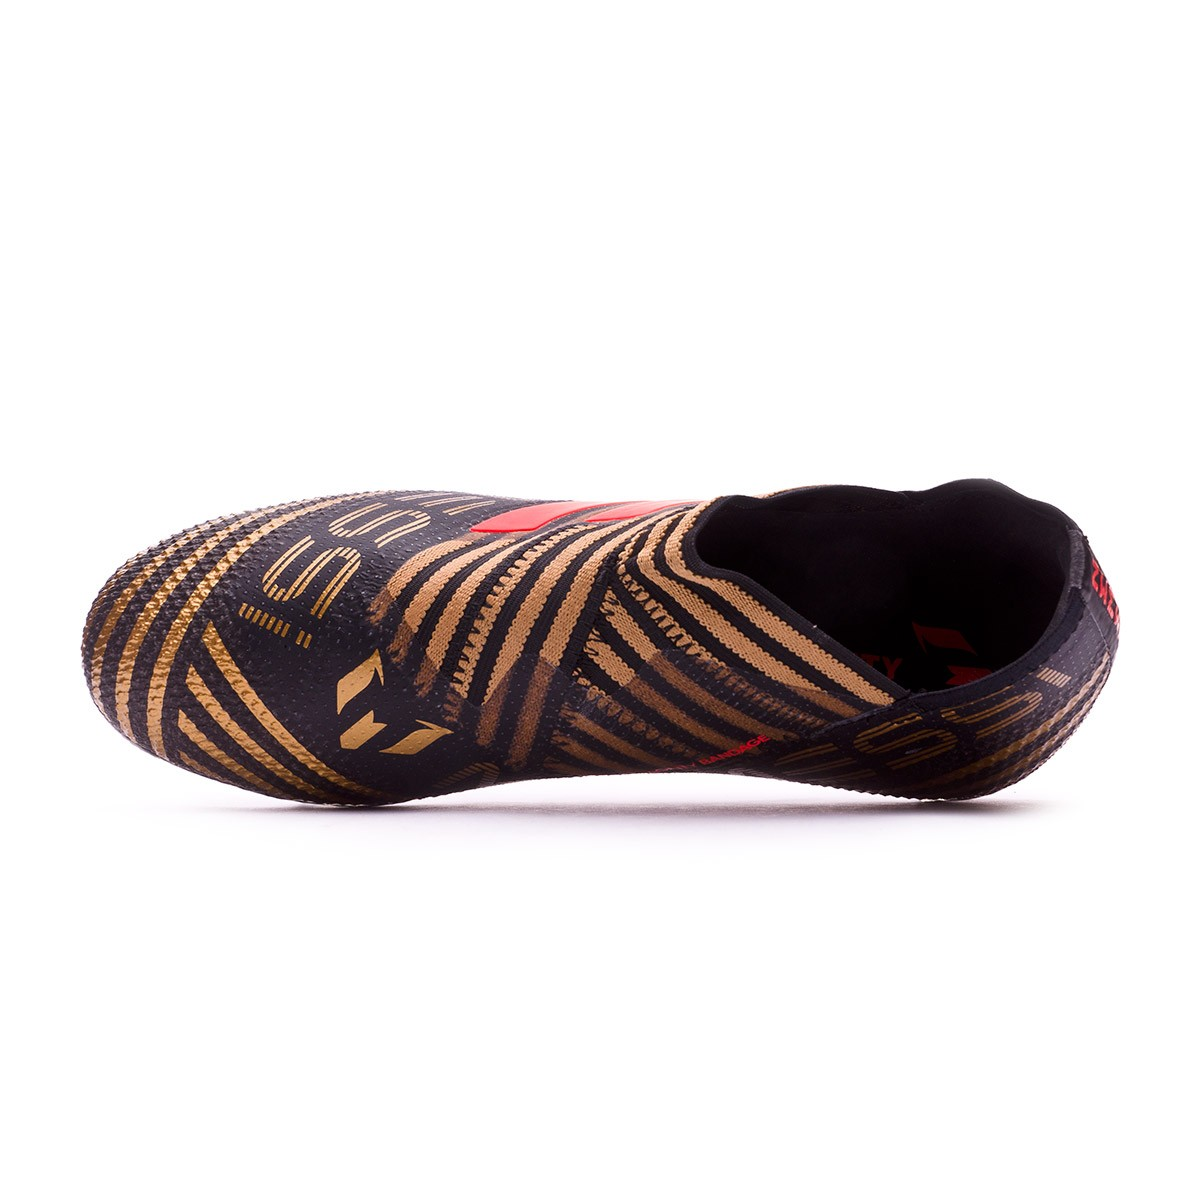 2734af1f6 Football Boots adidas Kids Nemeziz Messi 17+ 360 Agility Core black-Solar  red-Tactile gold metallic - Tienda de fútbol Fútbol Emotion